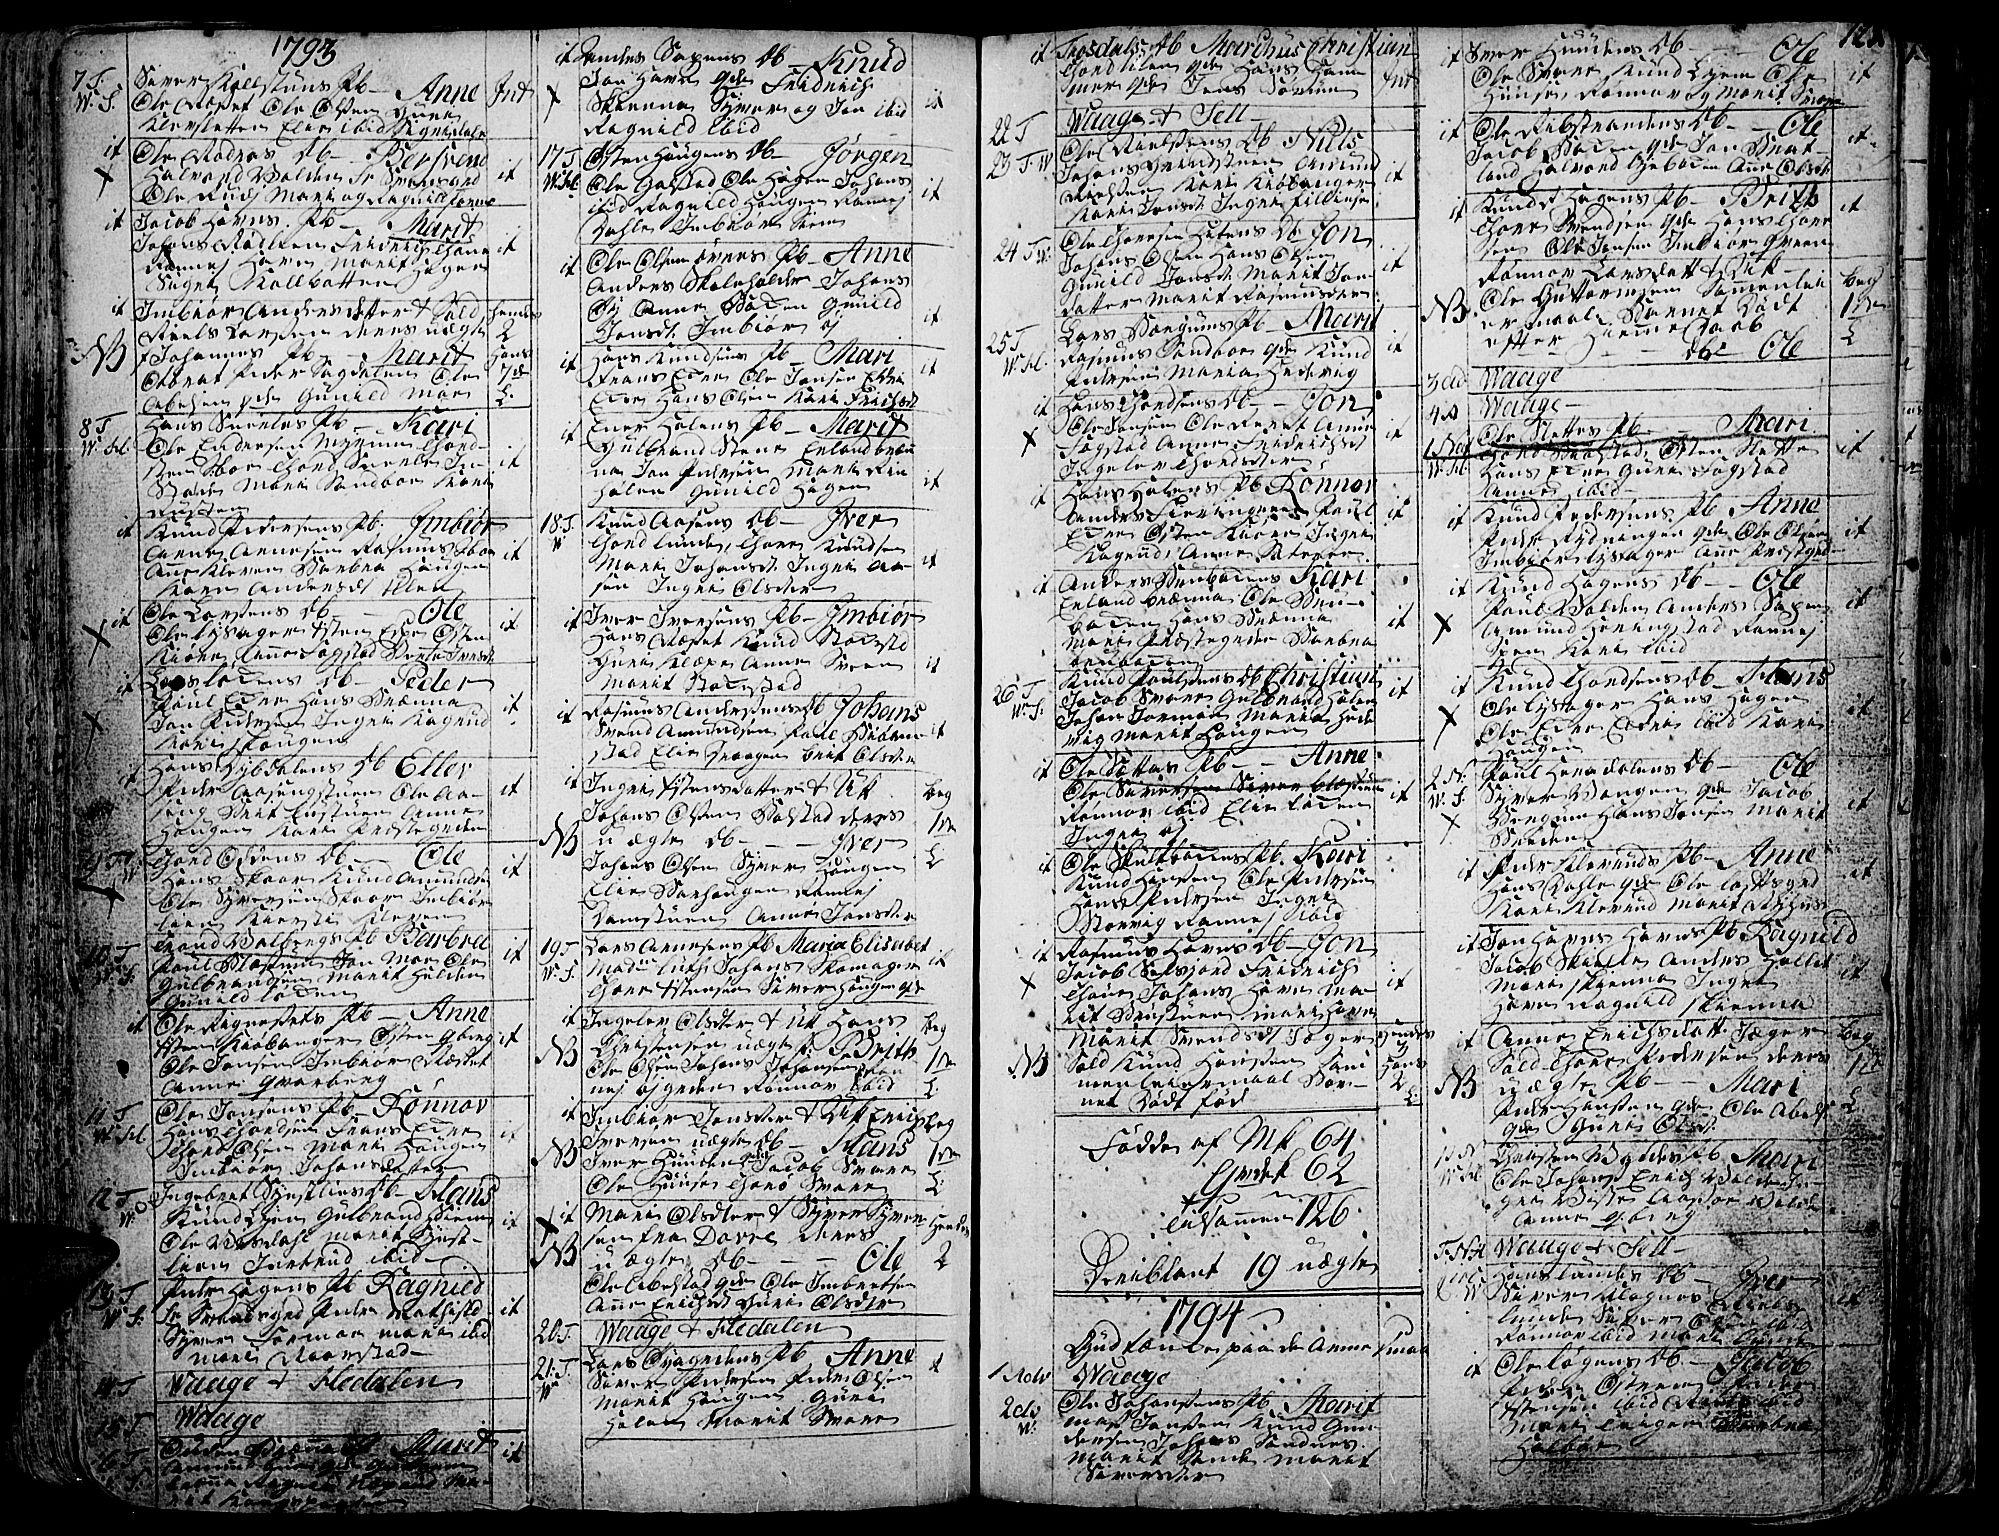 SAH, Vågå prestekontor, Ministerialbok nr. 1, 1739-1810, s. 123